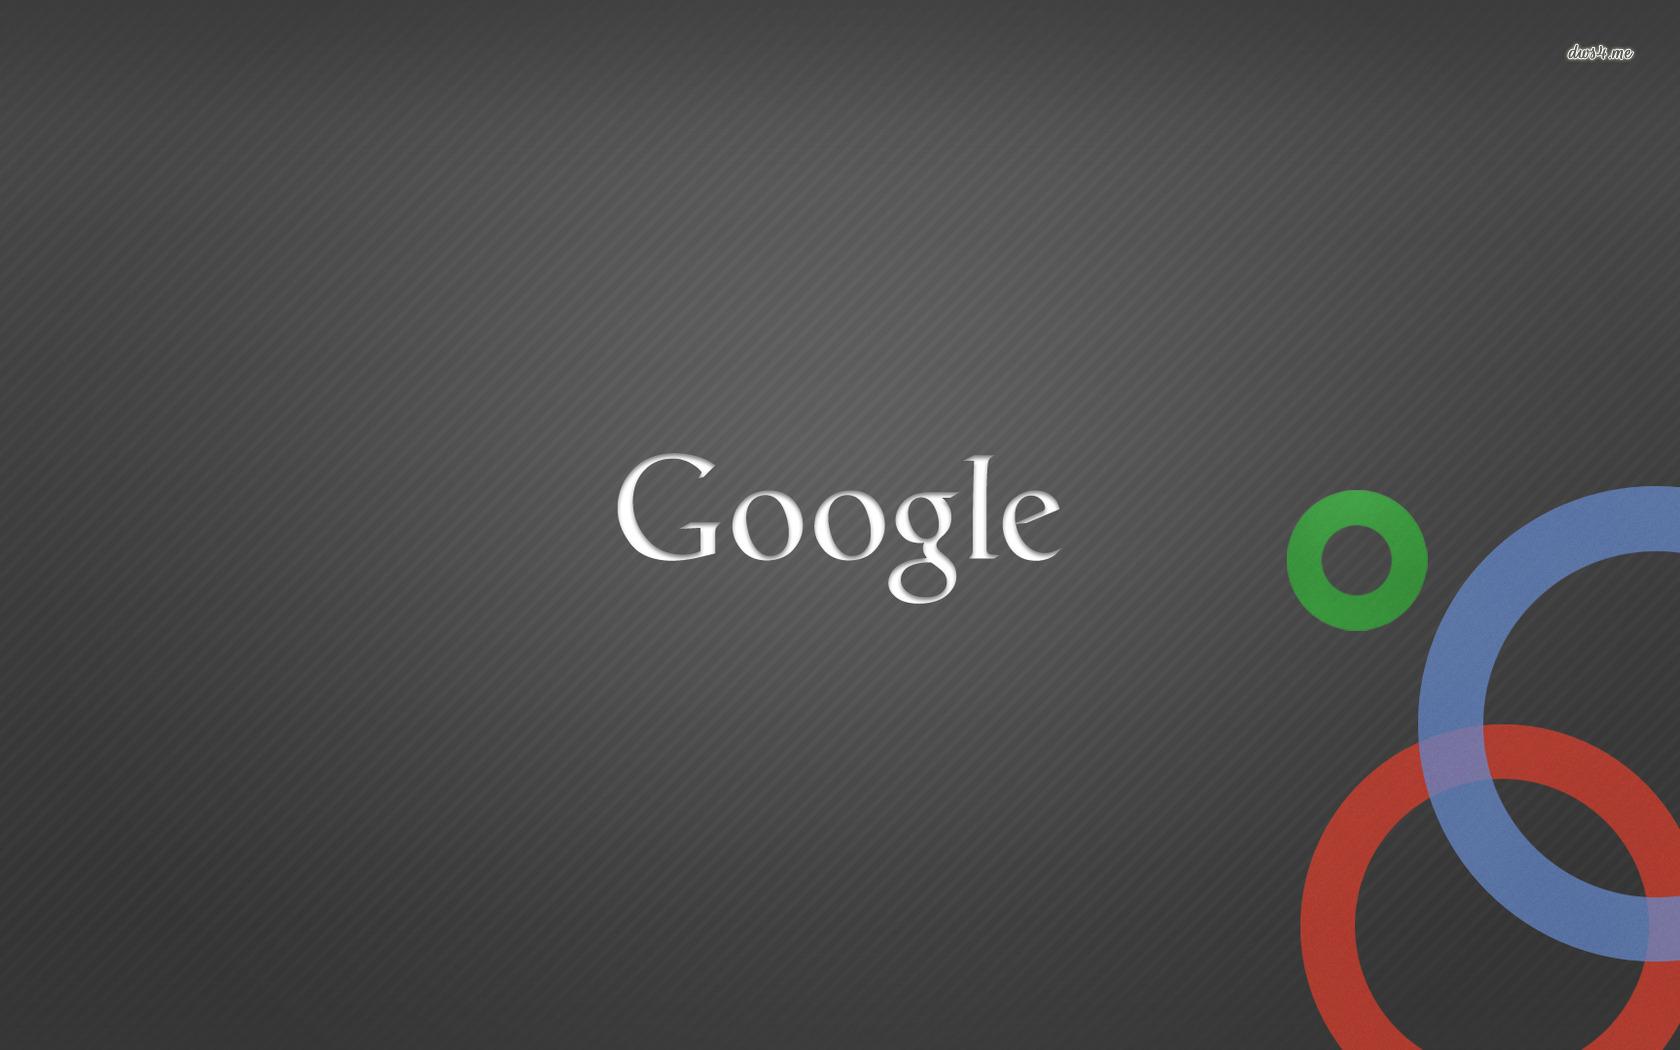 Google wallpaper 1280x800 Google wallpaper 1366x768 Google wallpaper 1680x1050